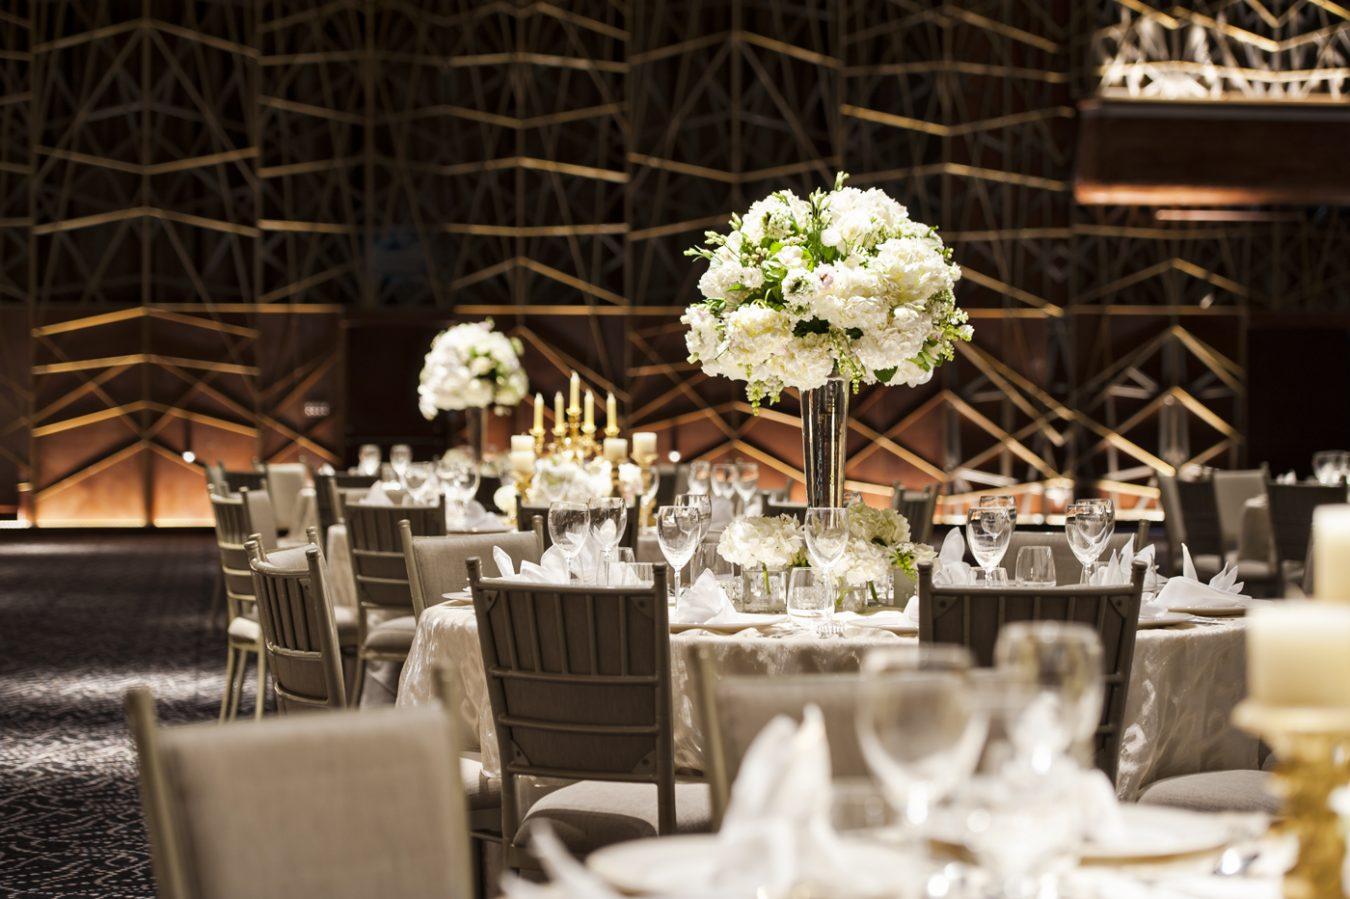 Wedding set up at Dubai Opera